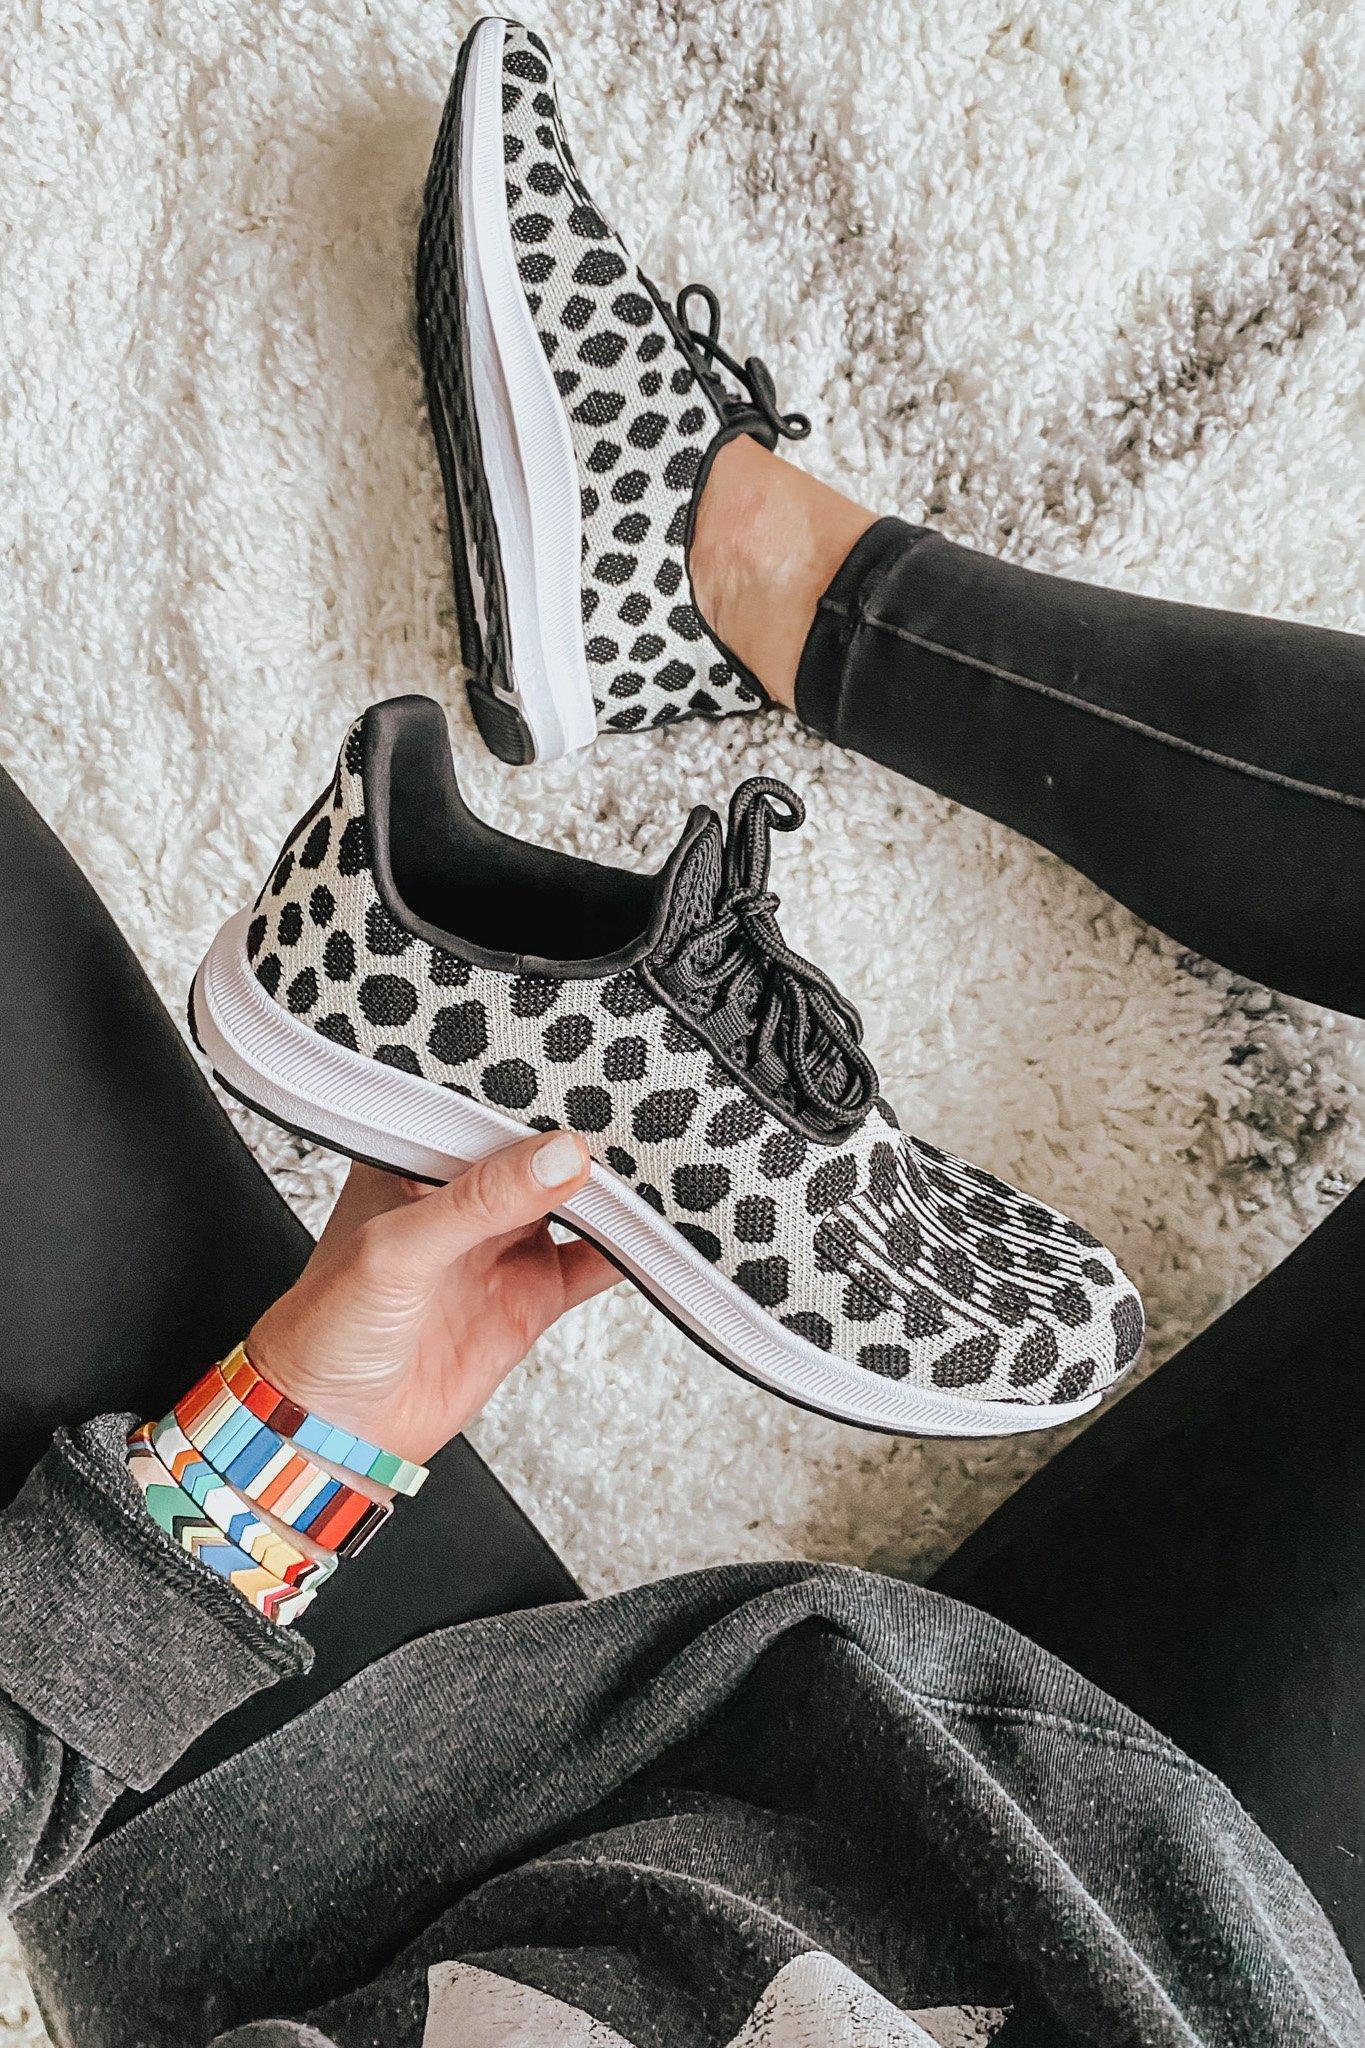 Adidas Walmart dupes, Spanx camo leggings dupe